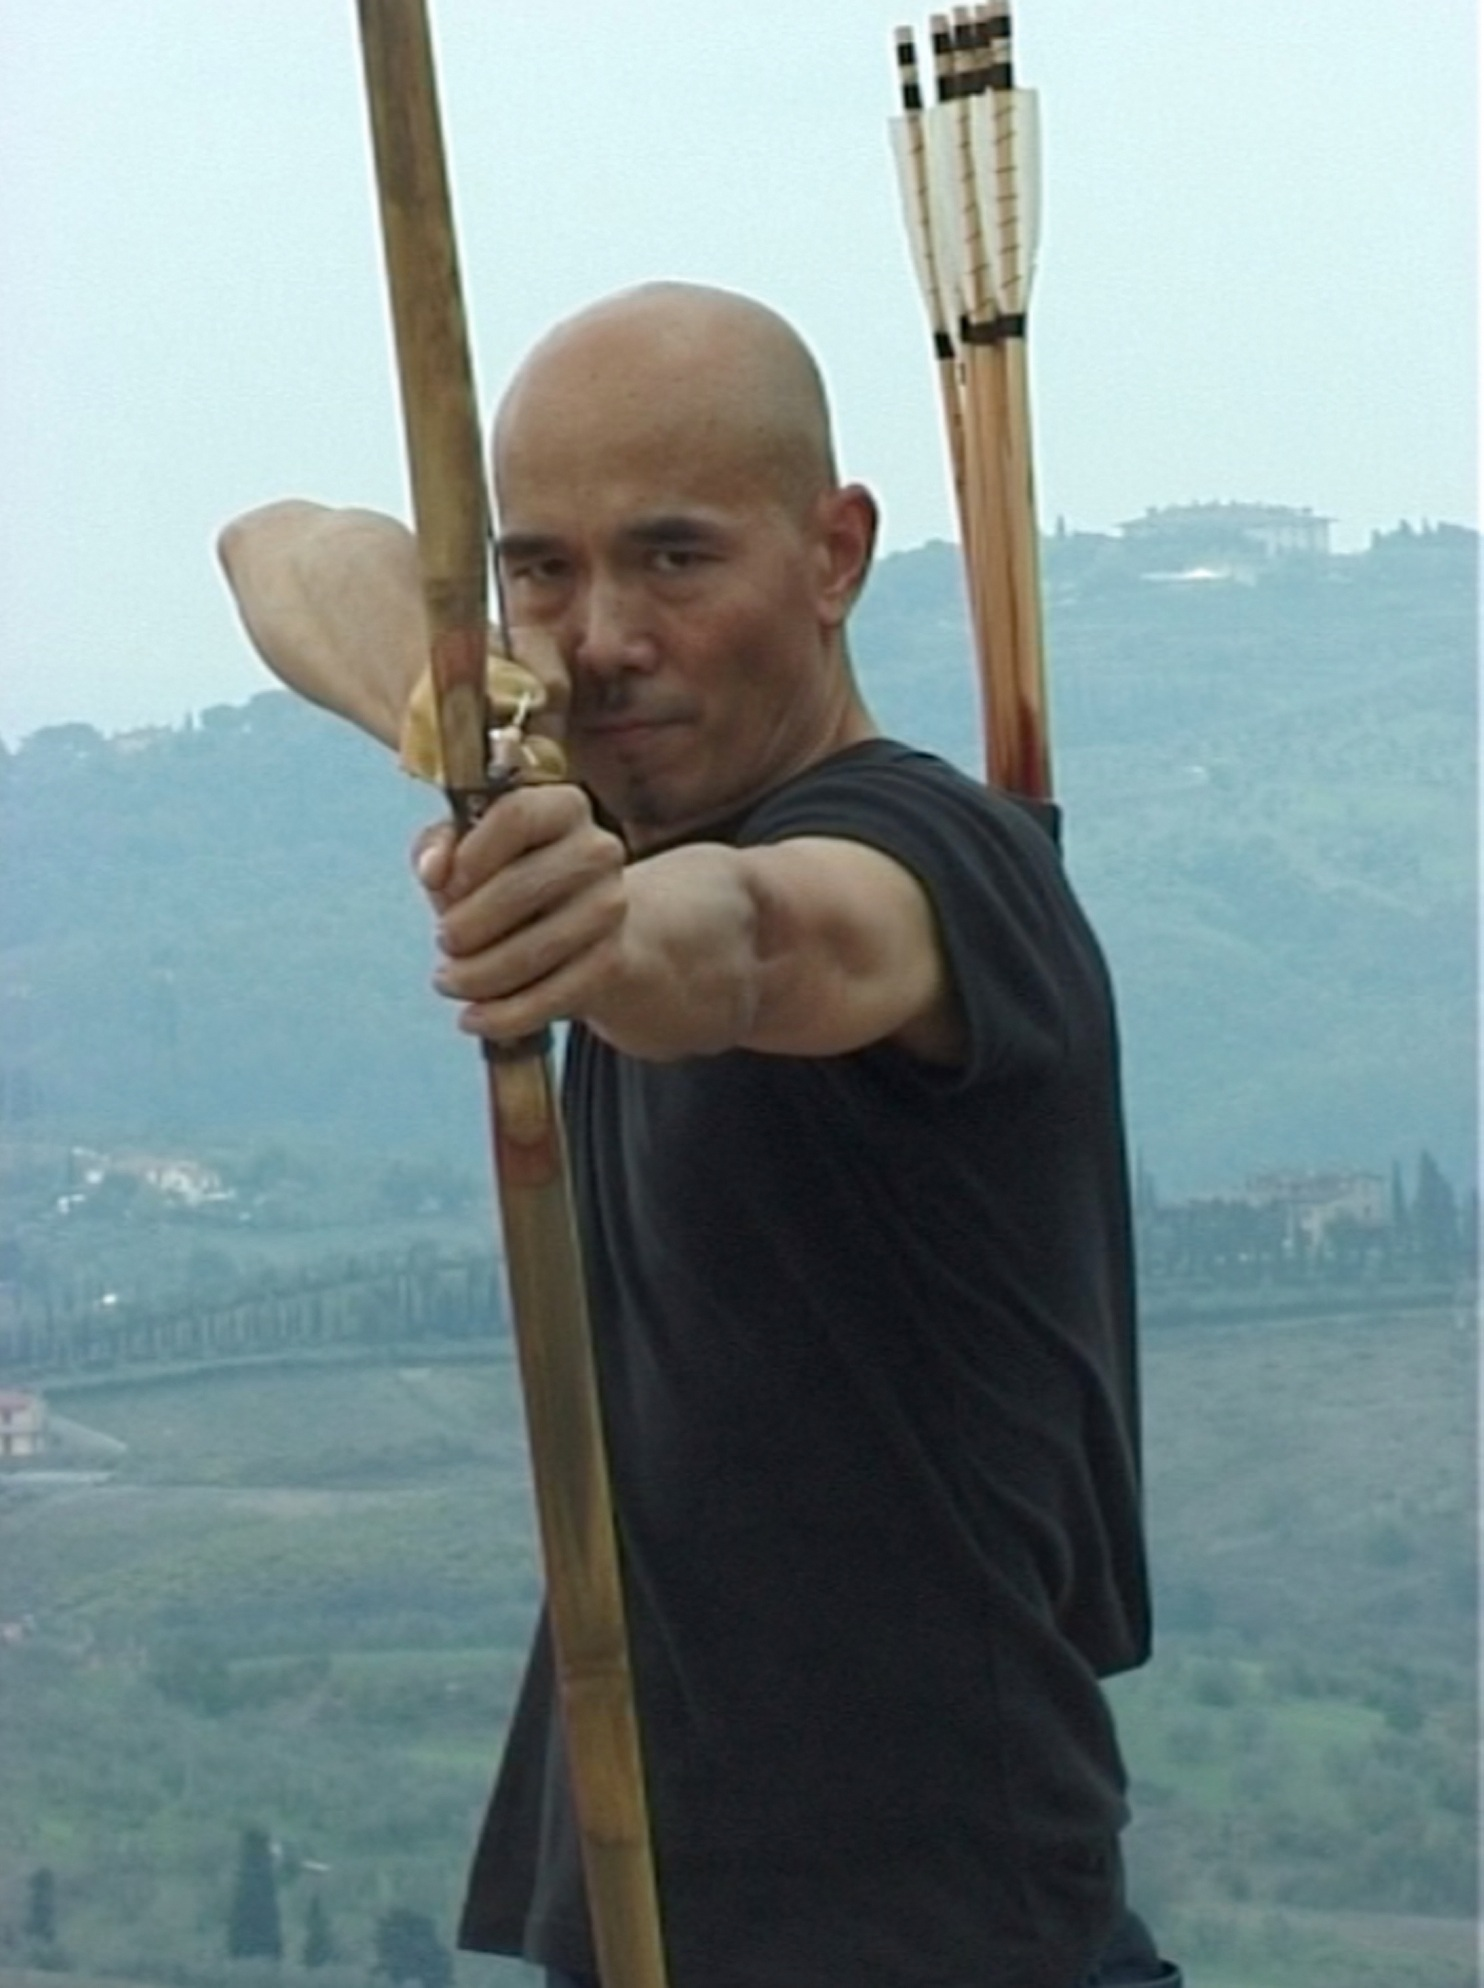 Yang Jiechang dans la vidéo Landscape Da Vinci, 2009.